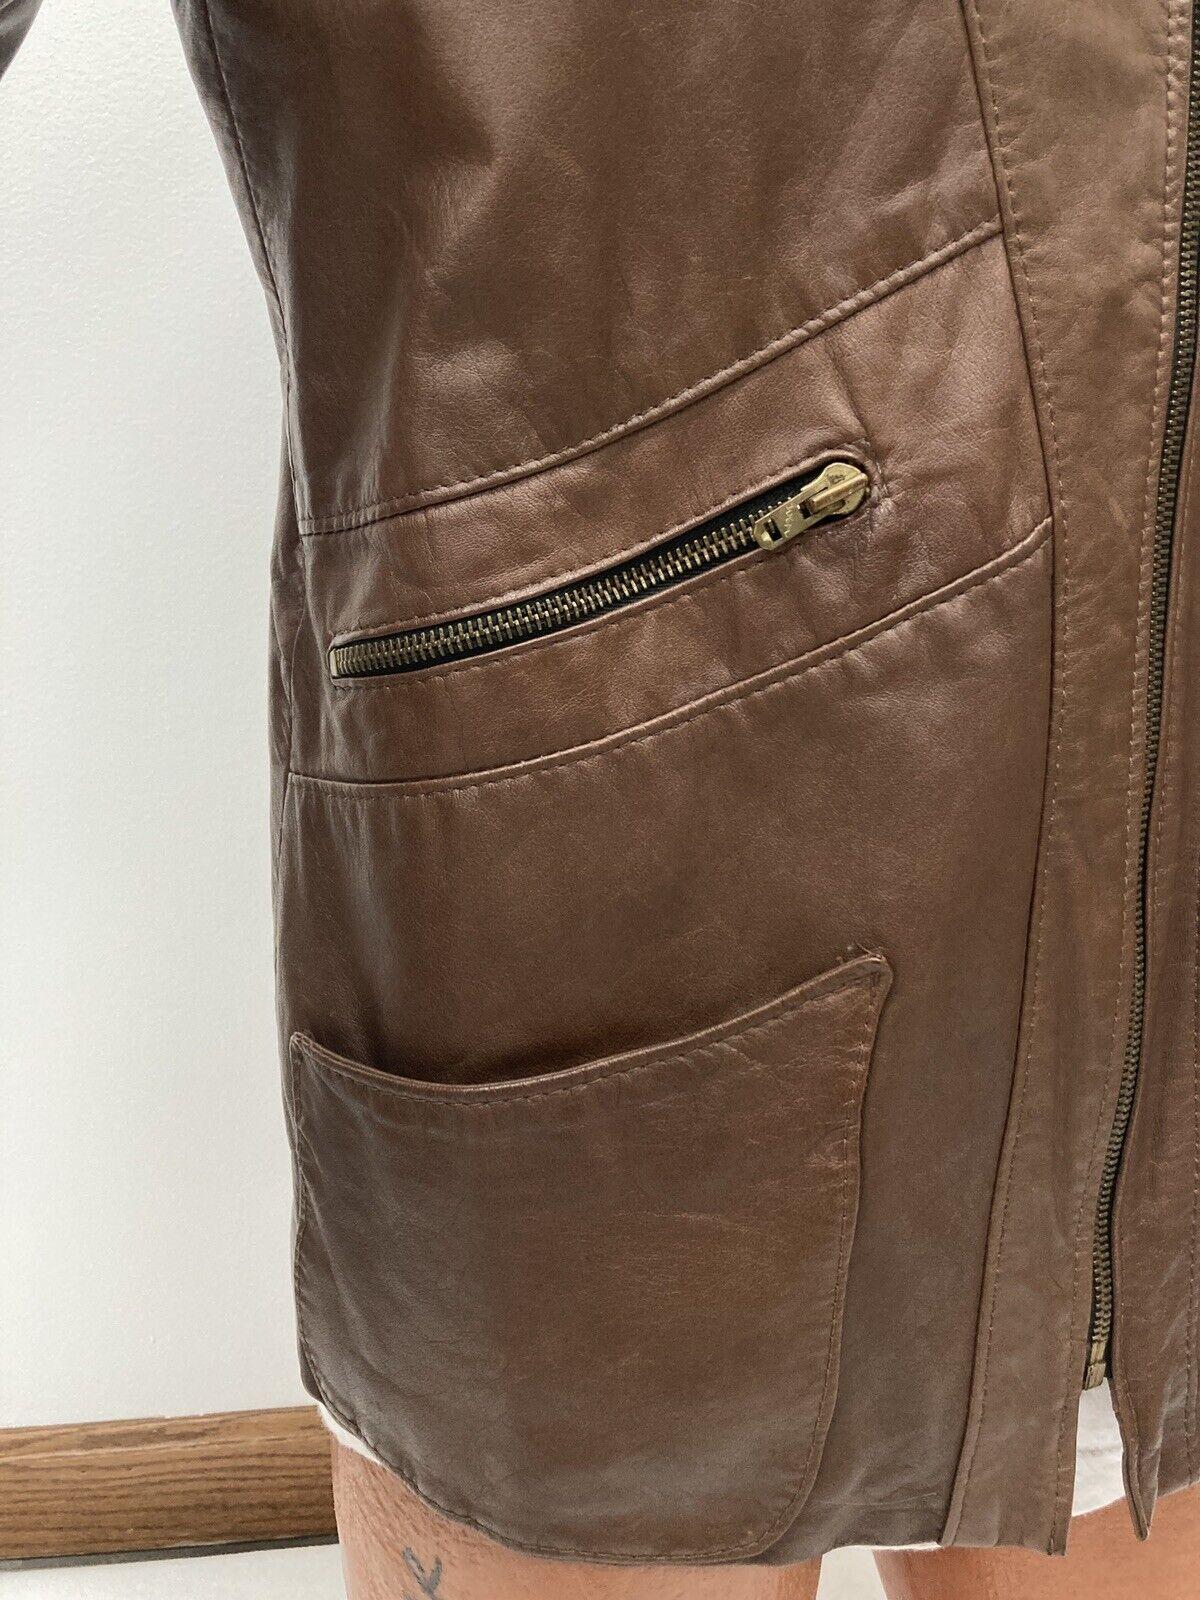 Genuine Vintage 1970s Brown Leather Blazer Jacket… - image 5